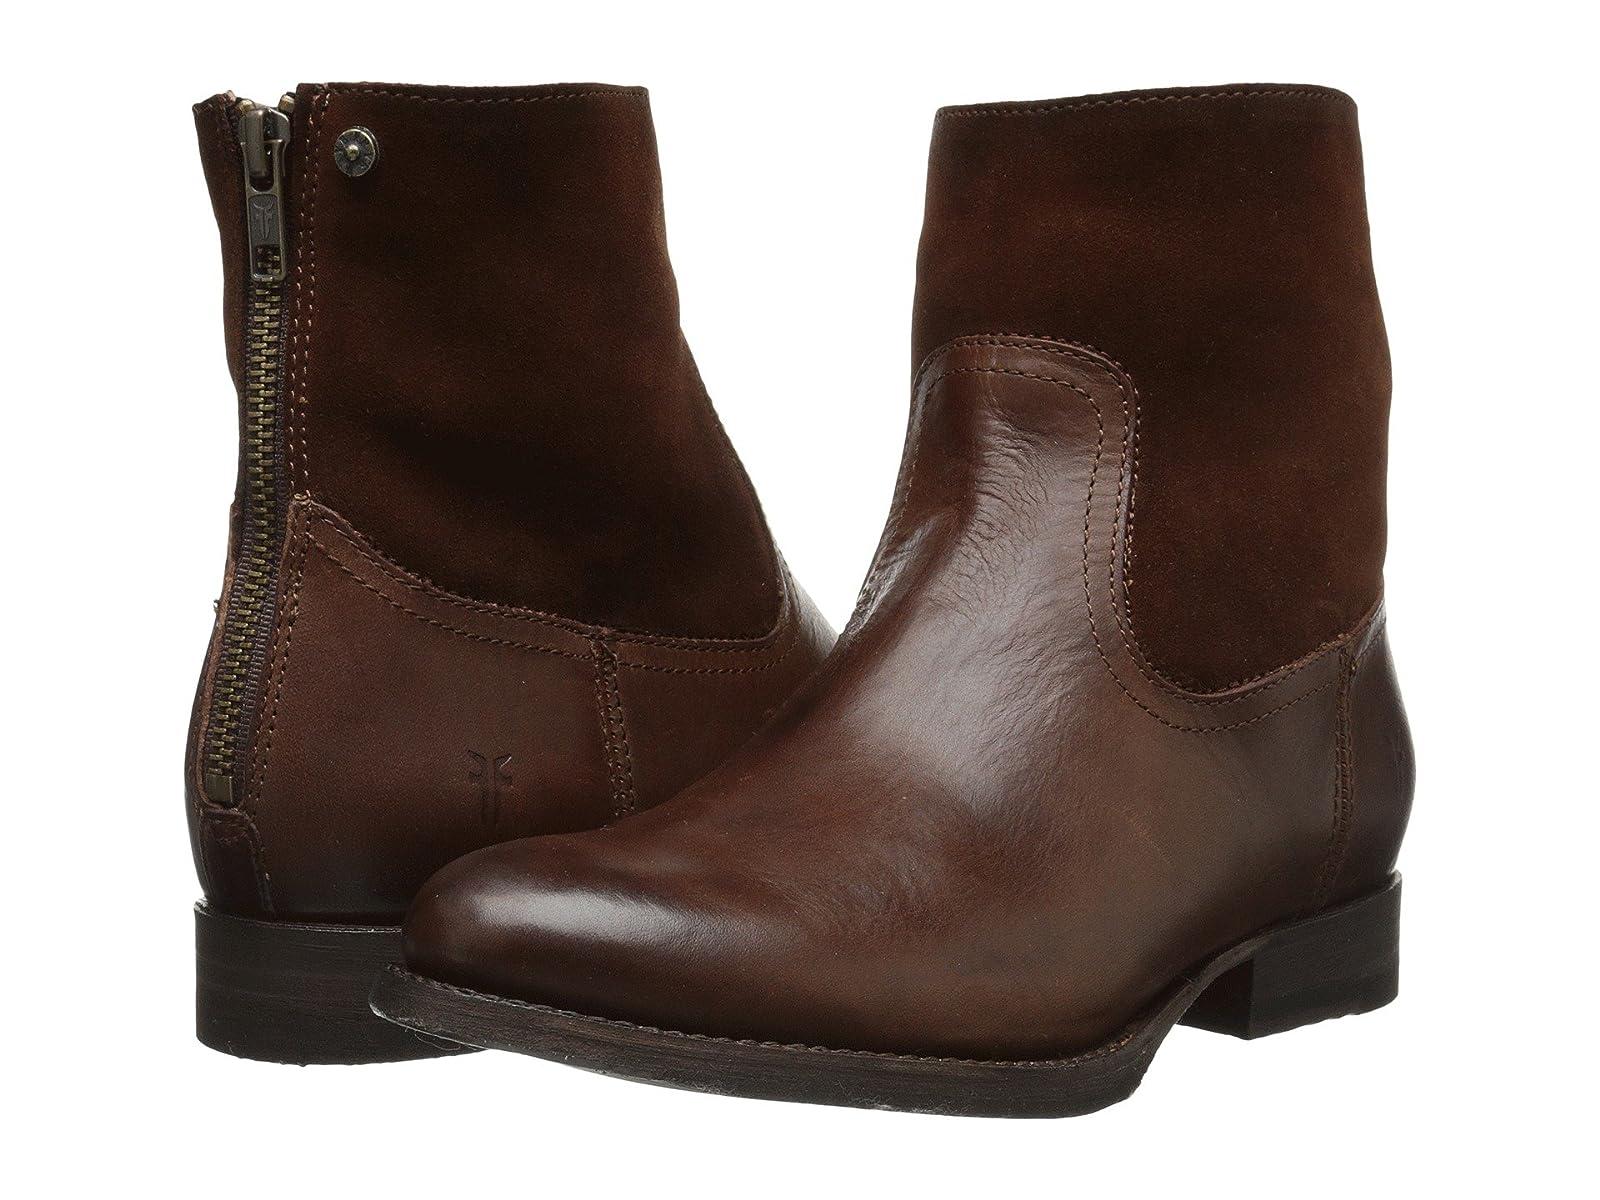 Frye Jamie Zip BootieCheap and distinctive eye-catching shoes